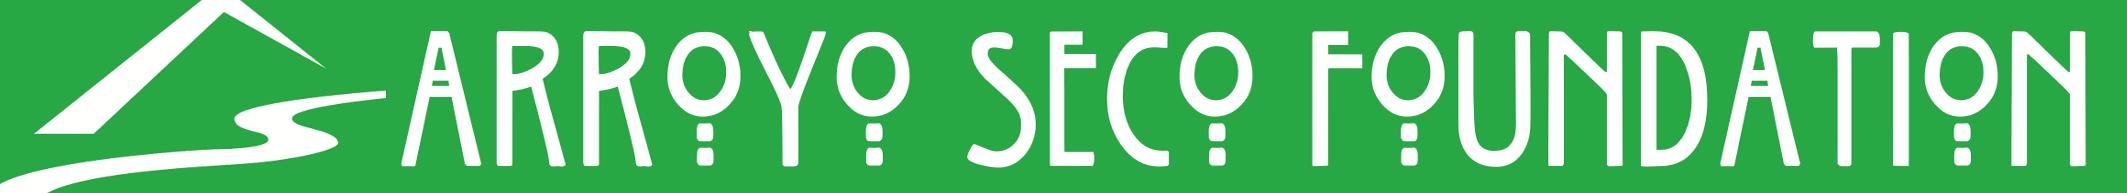 ASF Banner